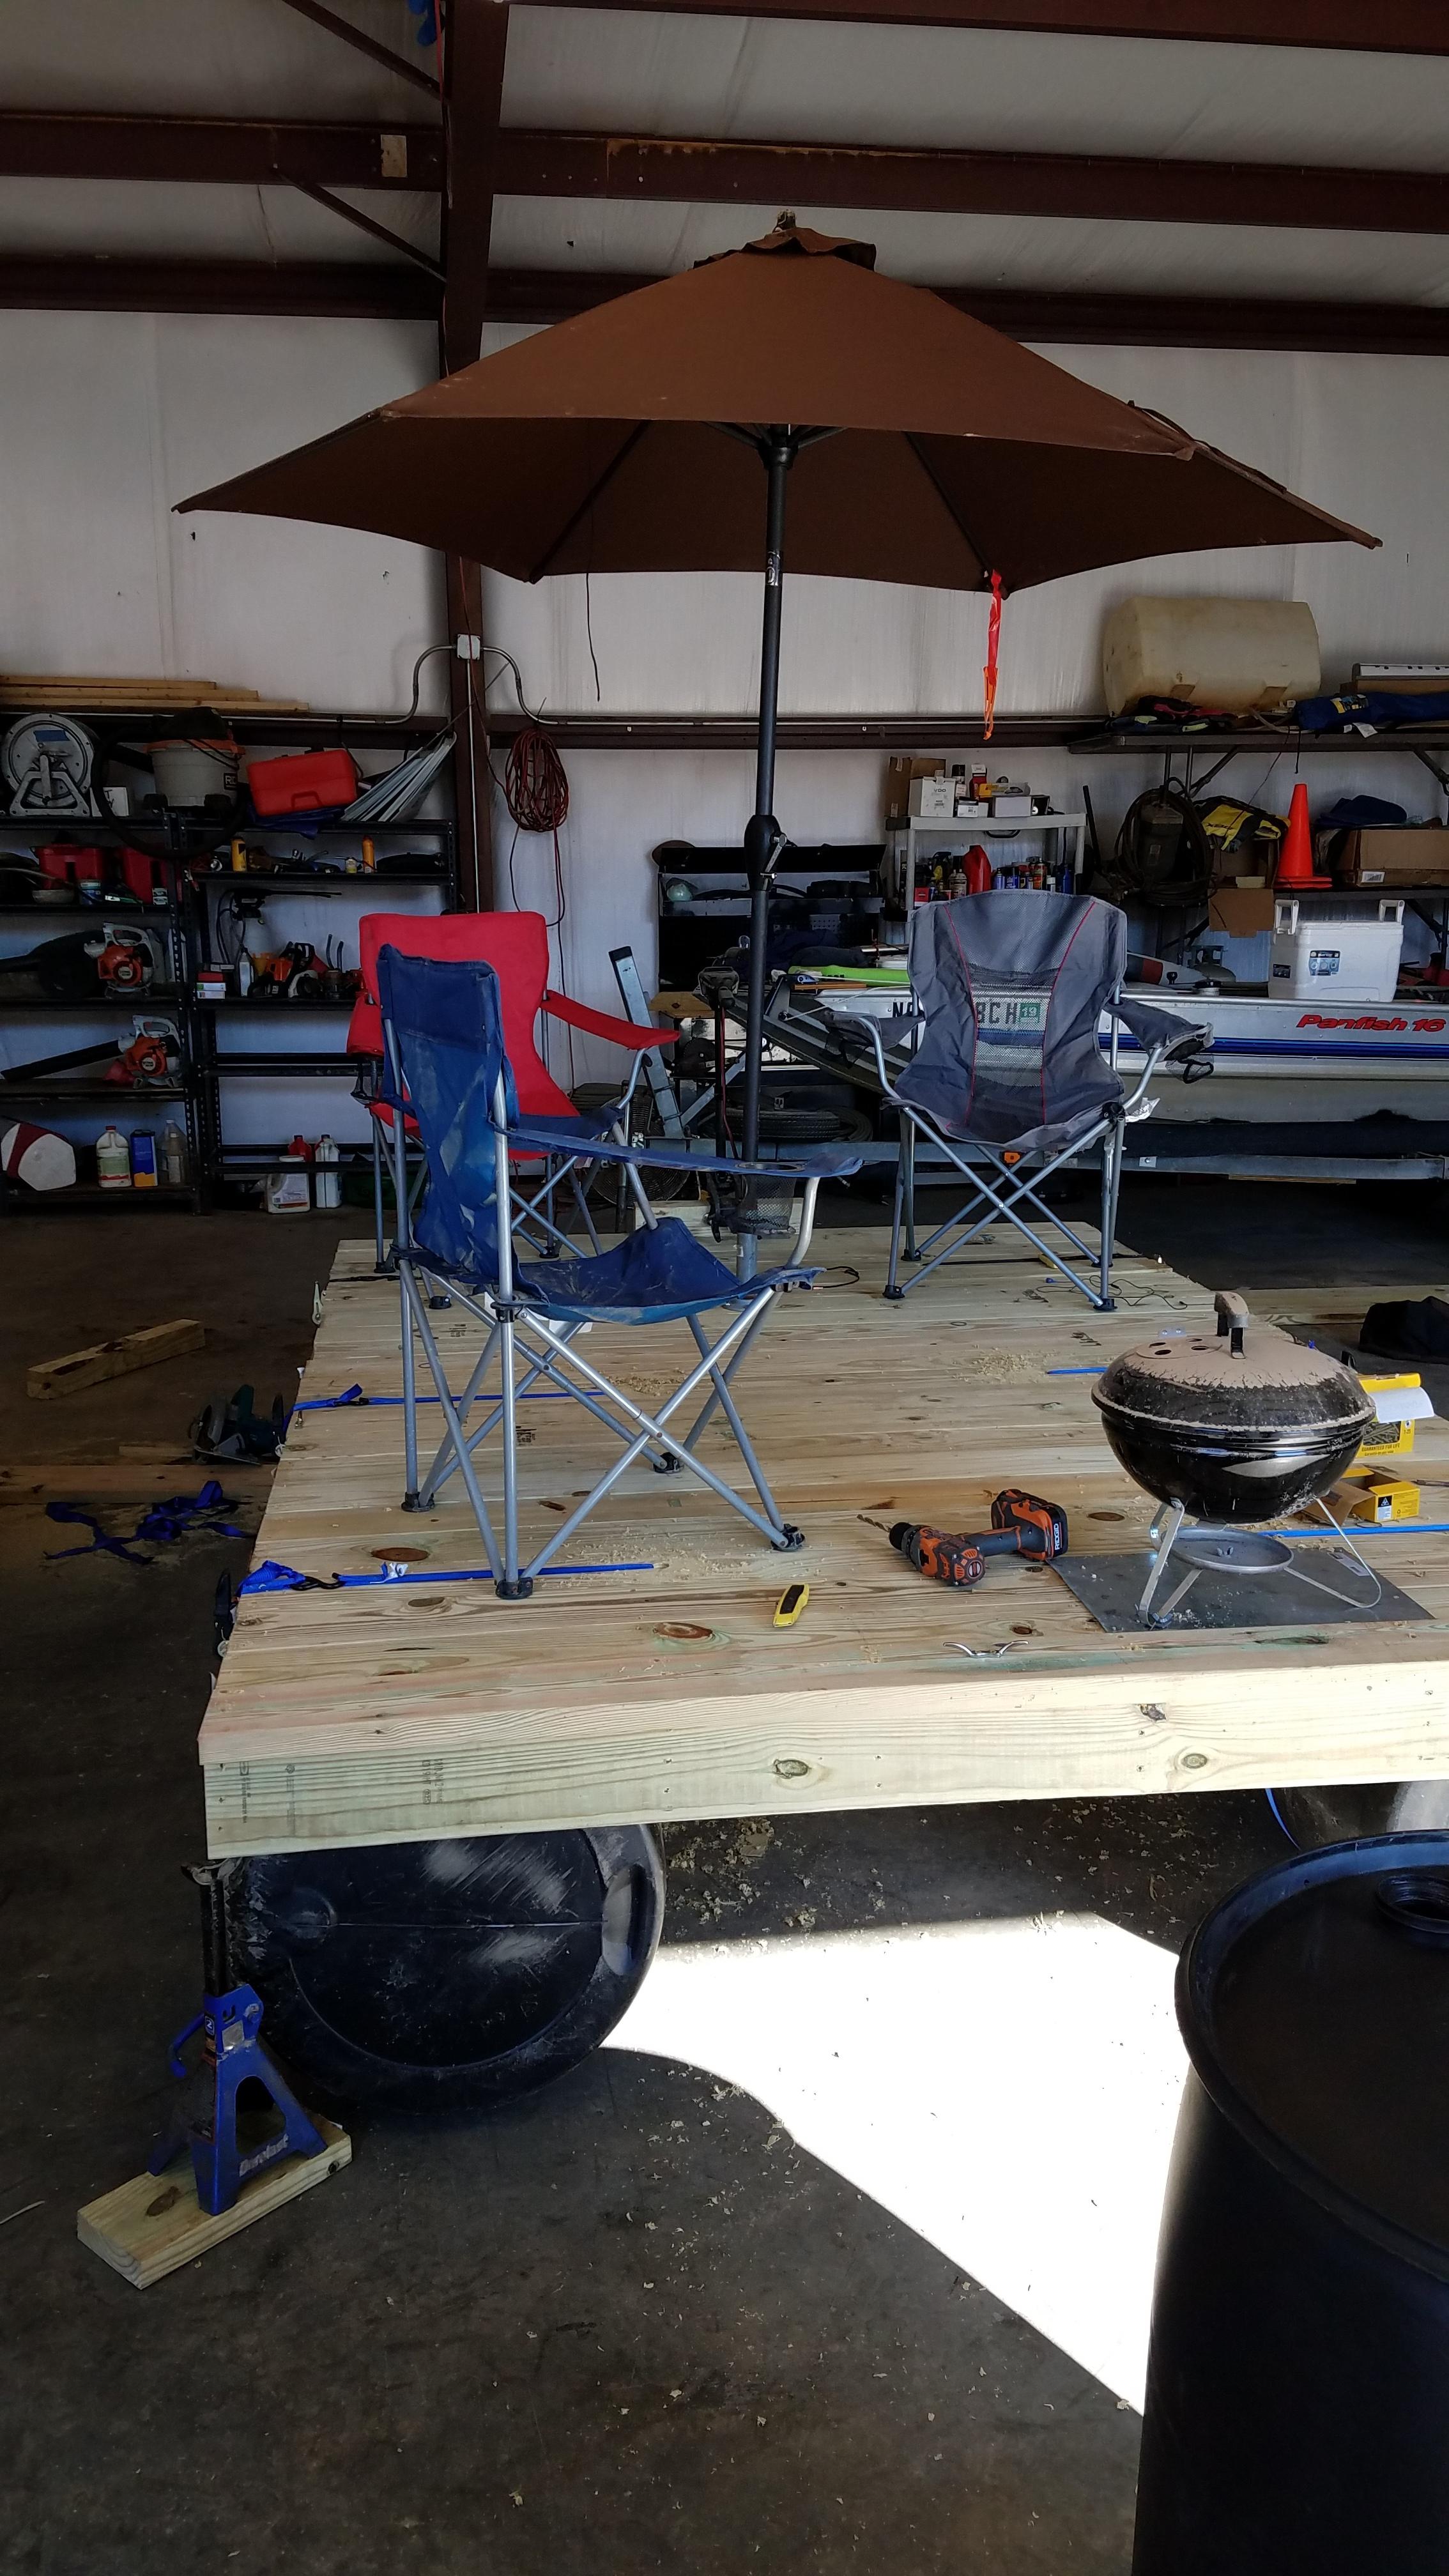 Raft Ideas Pressure Washing Resource - Picnic table raft